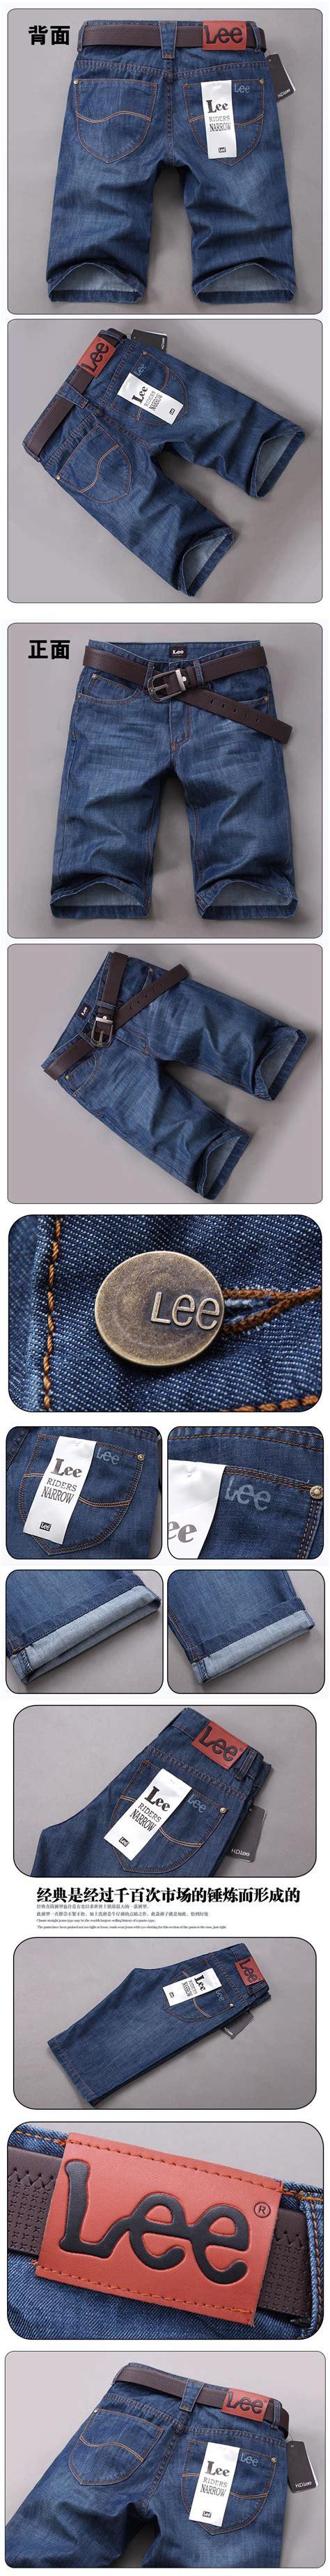 Harga Celana Pendek Merk Cole celana pria cp054 pfp store